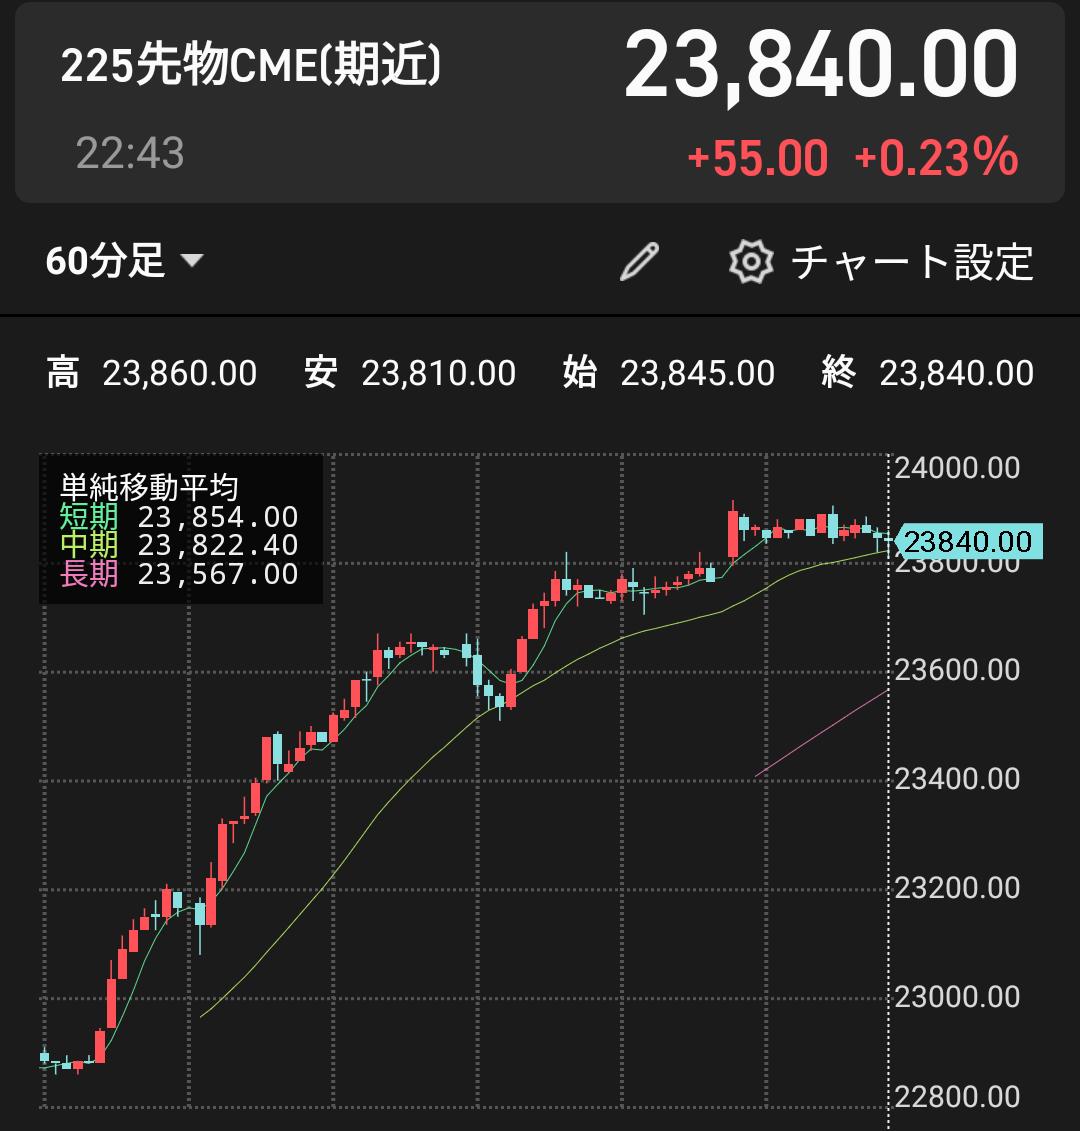 1357 - (NEXT FUNDS) 日経ダブルインバース上場投信 放物線~?